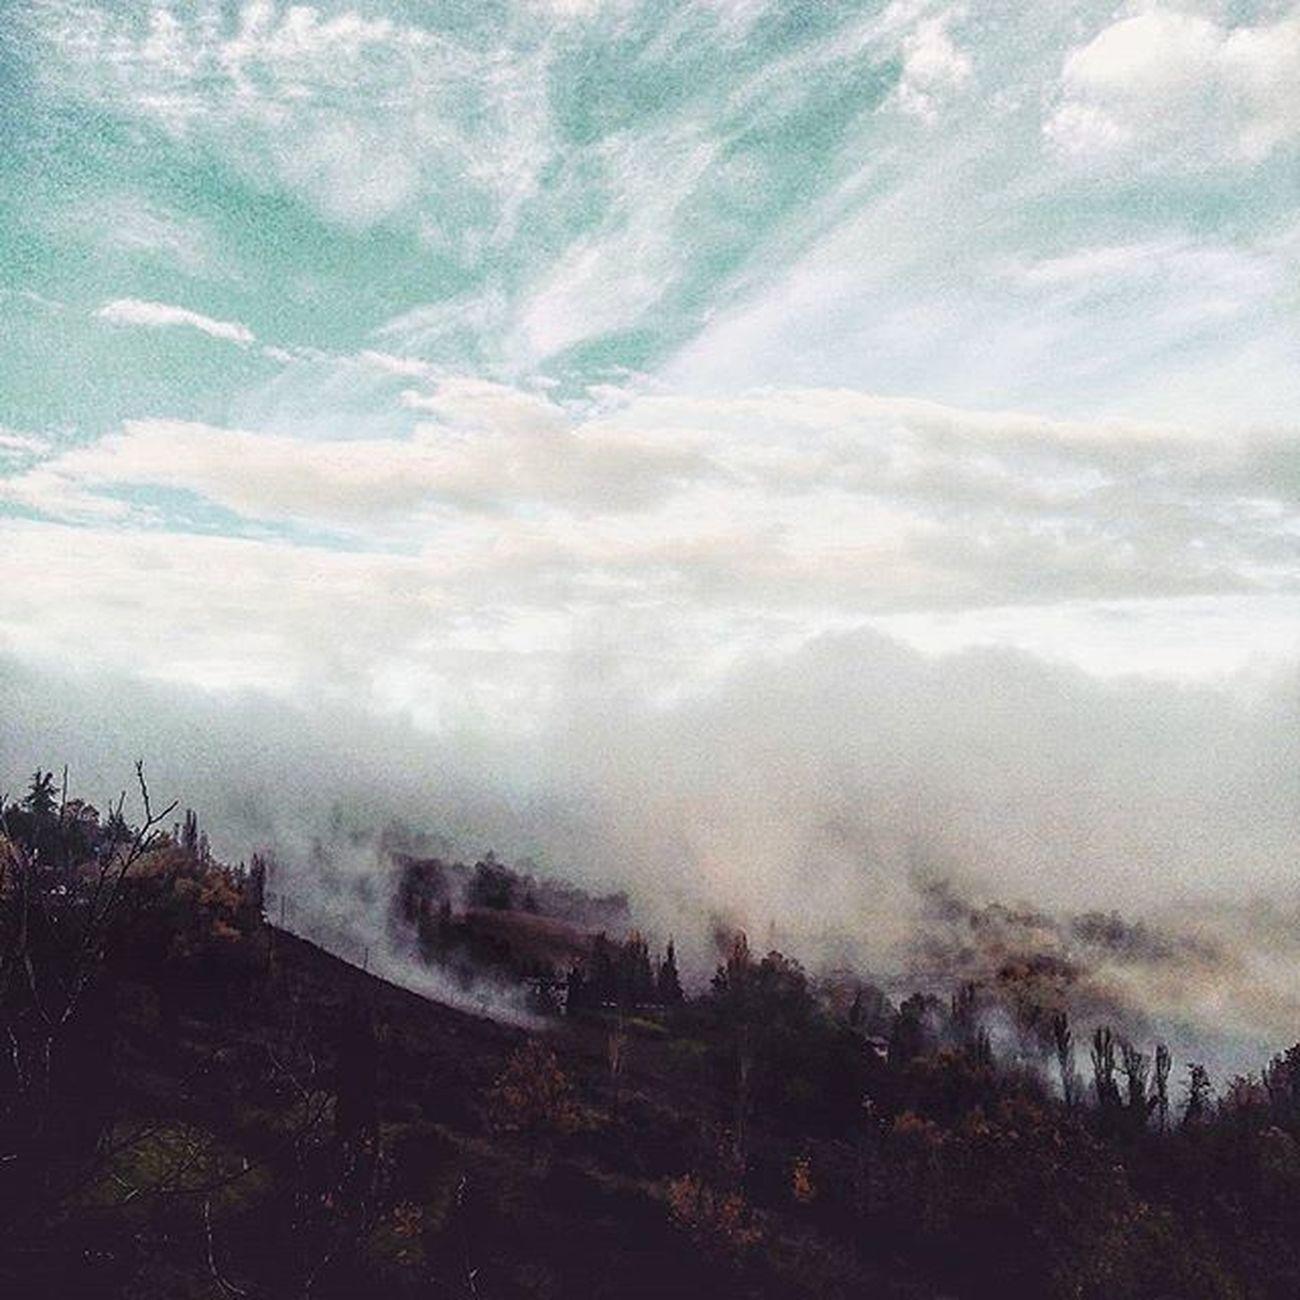 Nuvole in atterraggio d'emergenza (?) Urbino Montefeltro Marche Marcheforyou Italy Italia SkyClouds Clouds Cloudscape Igersitalia Igersmarche Nature Naturelovers Nuvole Nebbia Fog Foggy Lategram Liveloveitalia Liveloveitaly